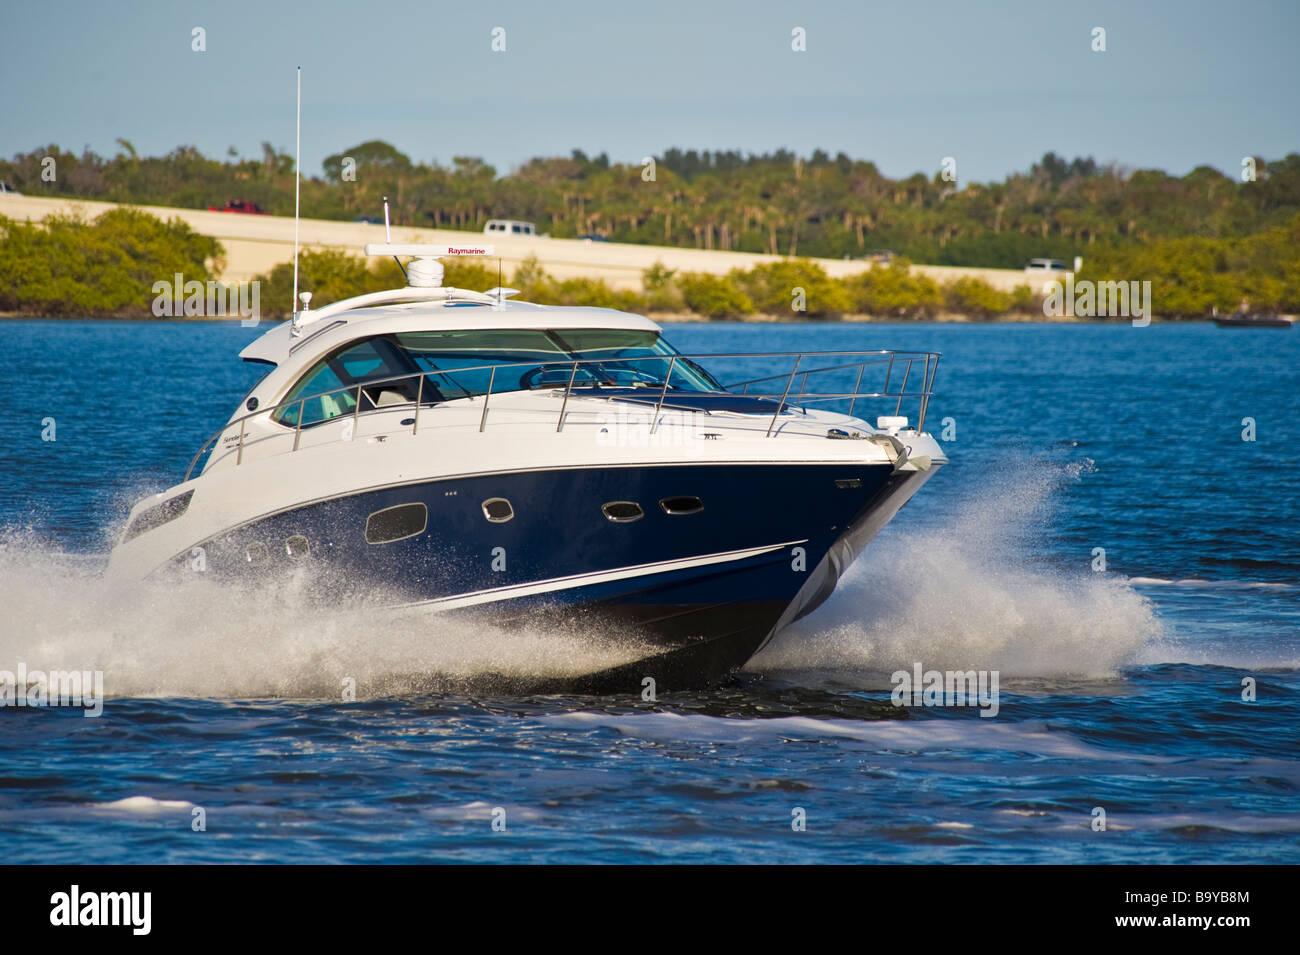 Sea Ray 43 Sea Ray 43 Sundancer powerboat on river in Florida USA Sea Ray 43 Sundancer Motoryacht auf einem Fluss - Stock Image